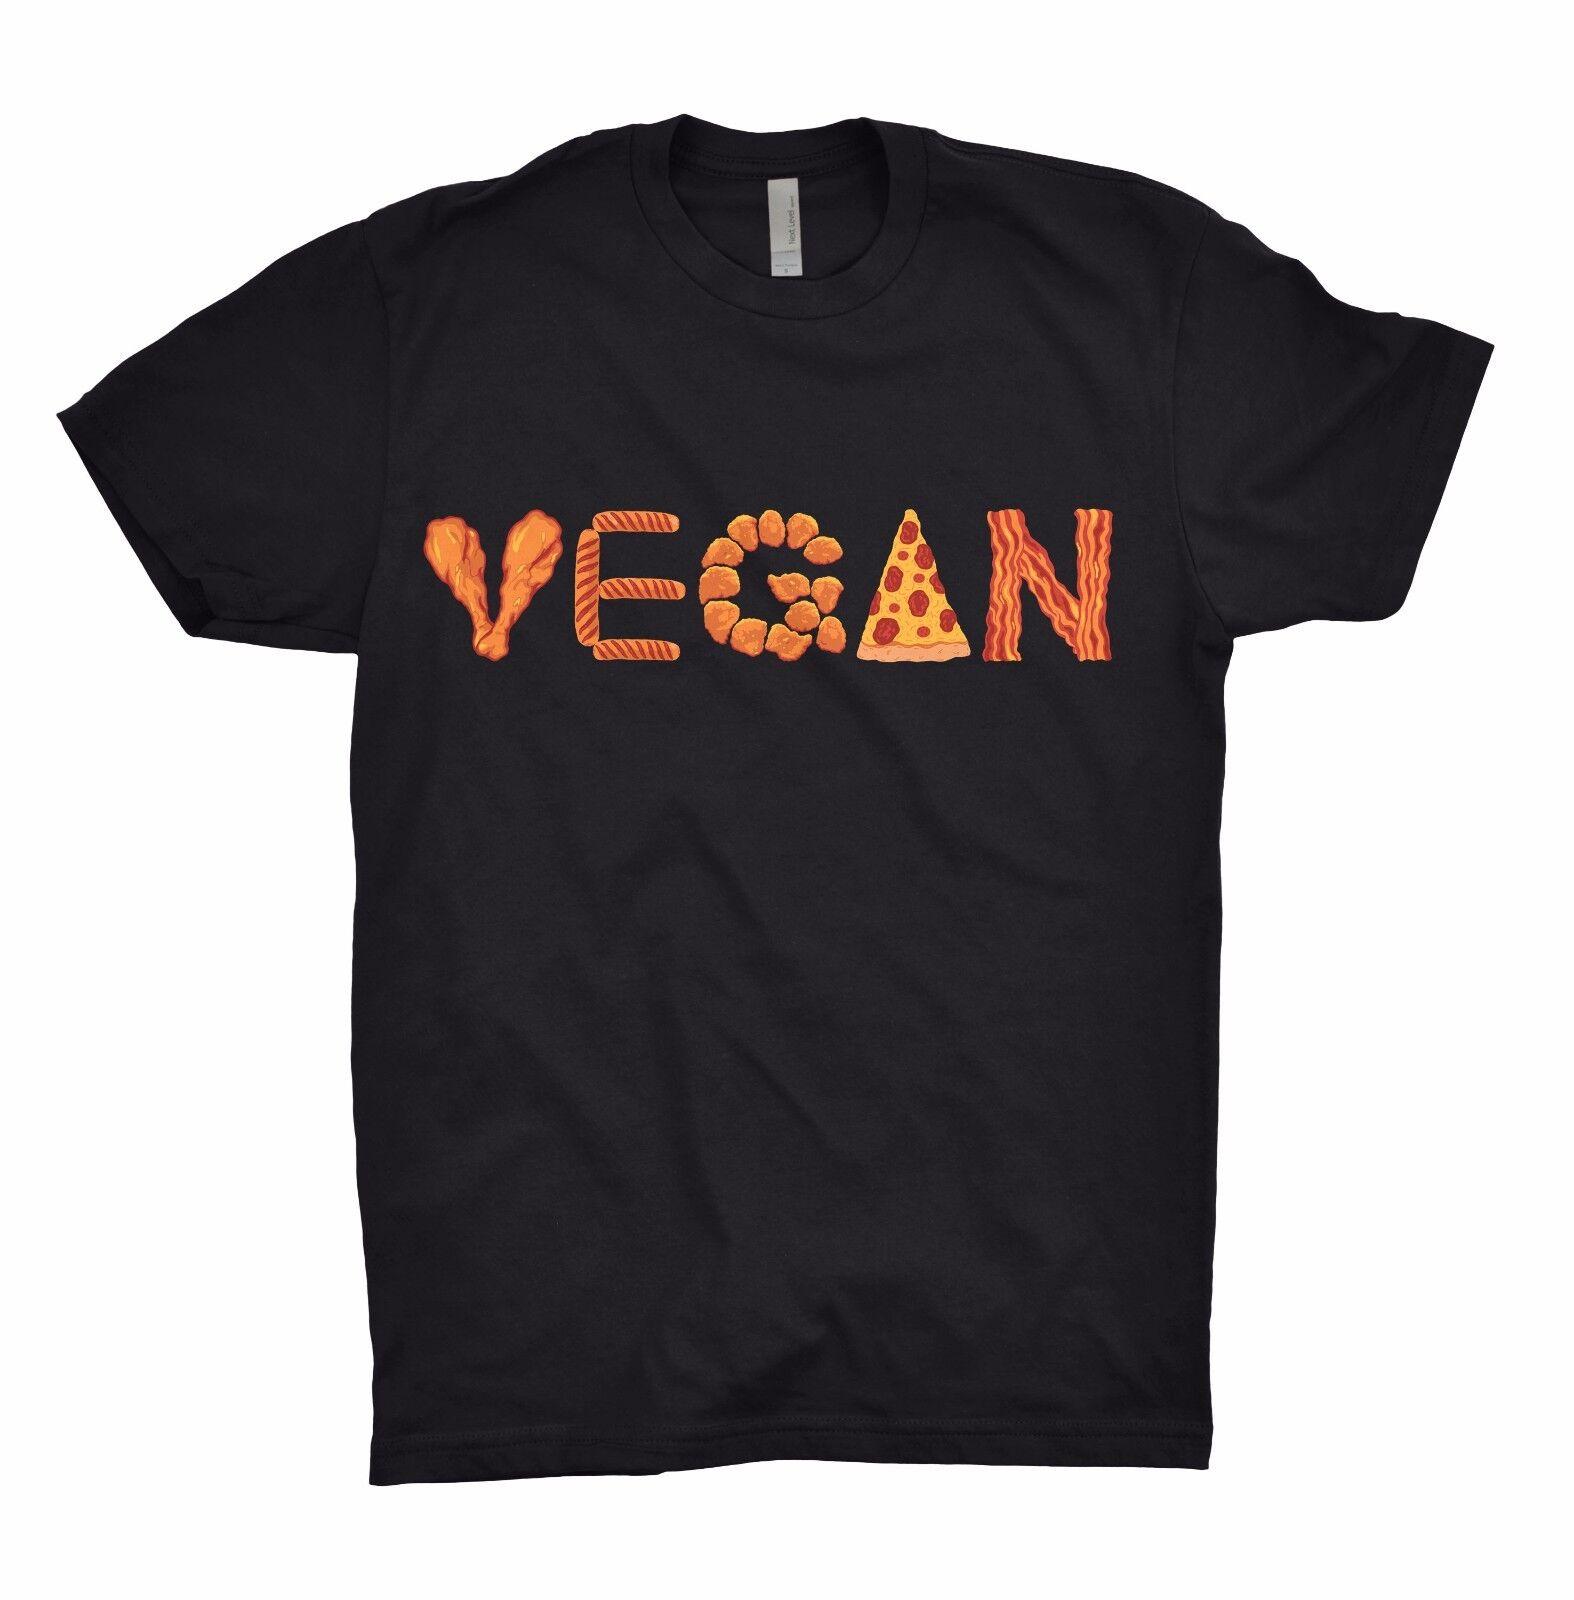 VEGAN T Shirt Diet Animals Are Friends Pizza Funny Chicken Bacon Netflix Avocado